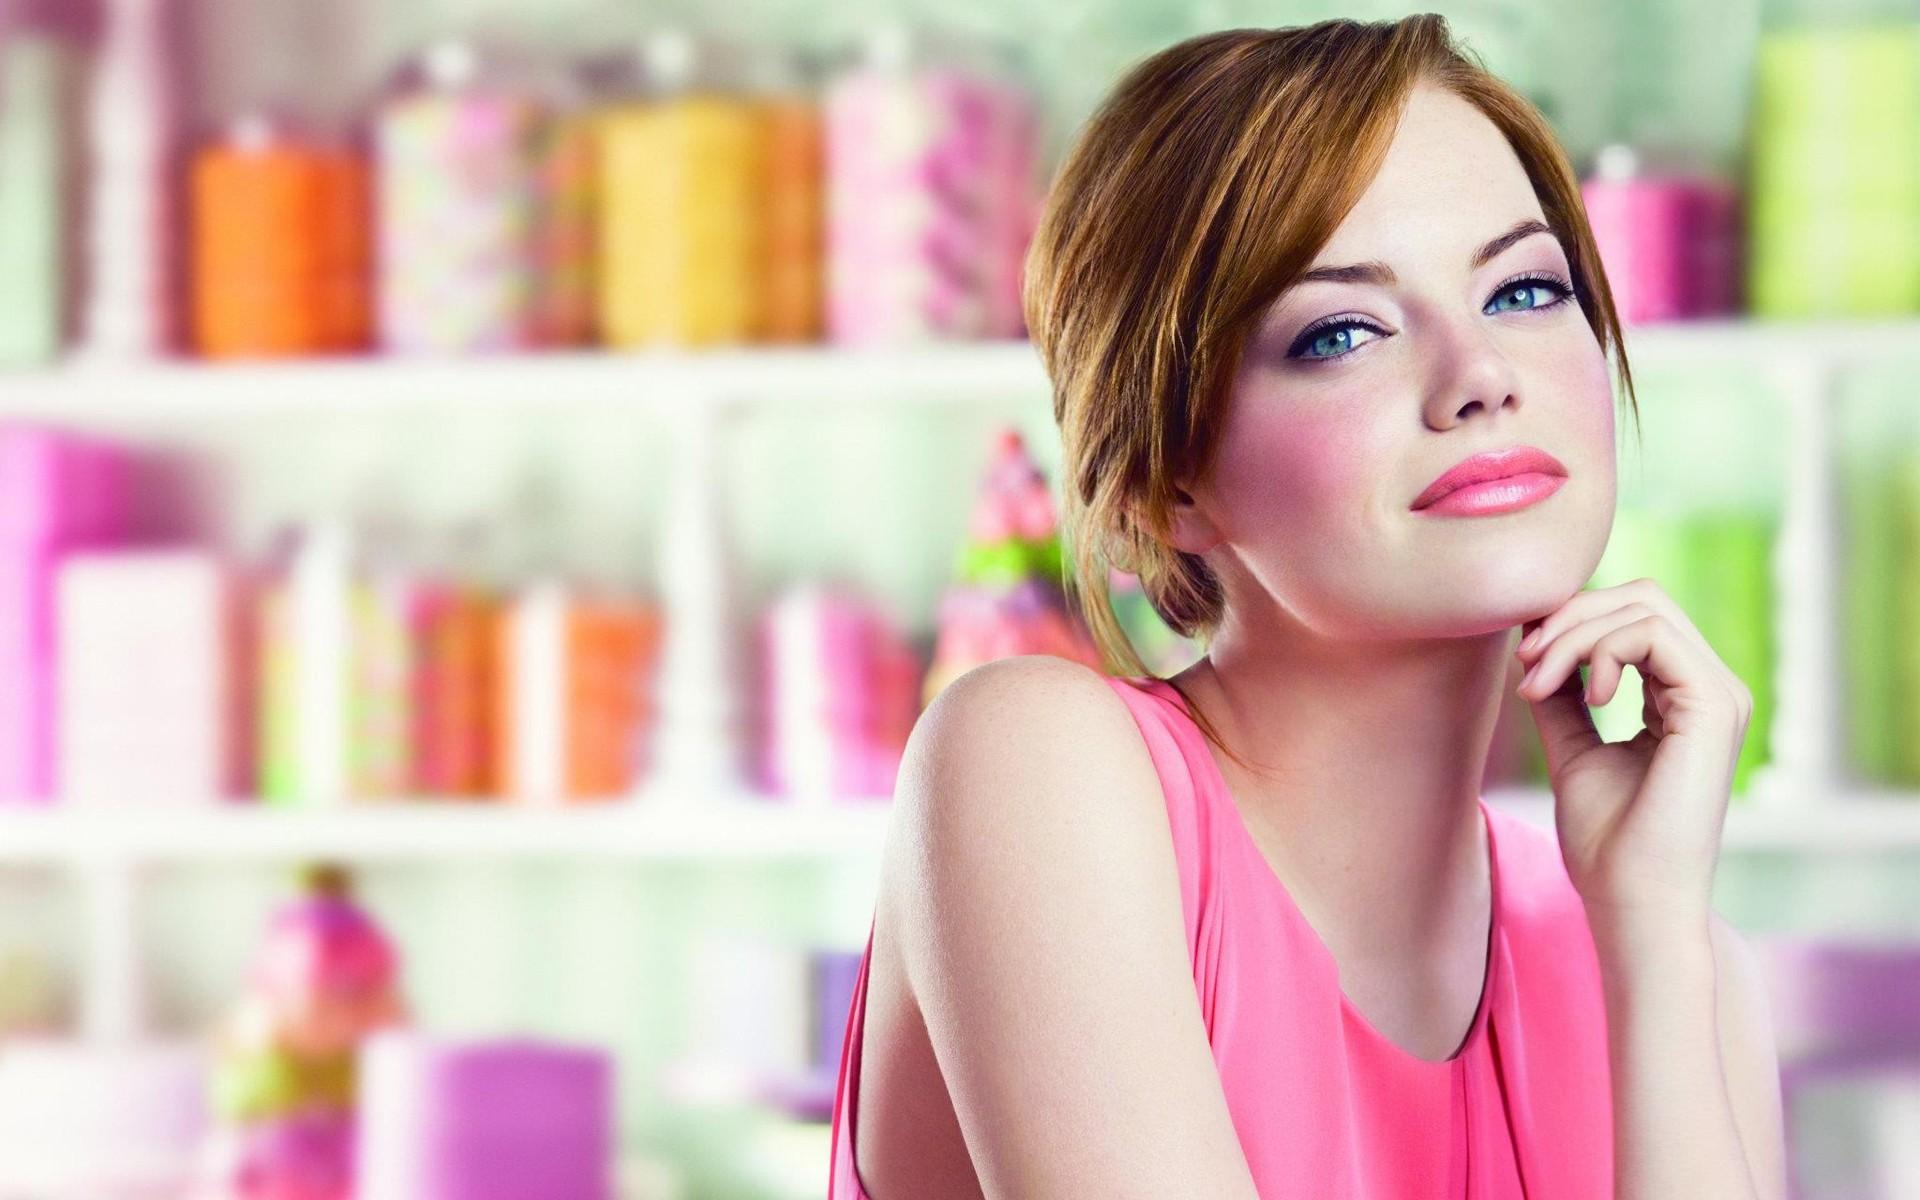 Wallpaper Face Women Redhead Blue Eyes Looking At Viewer